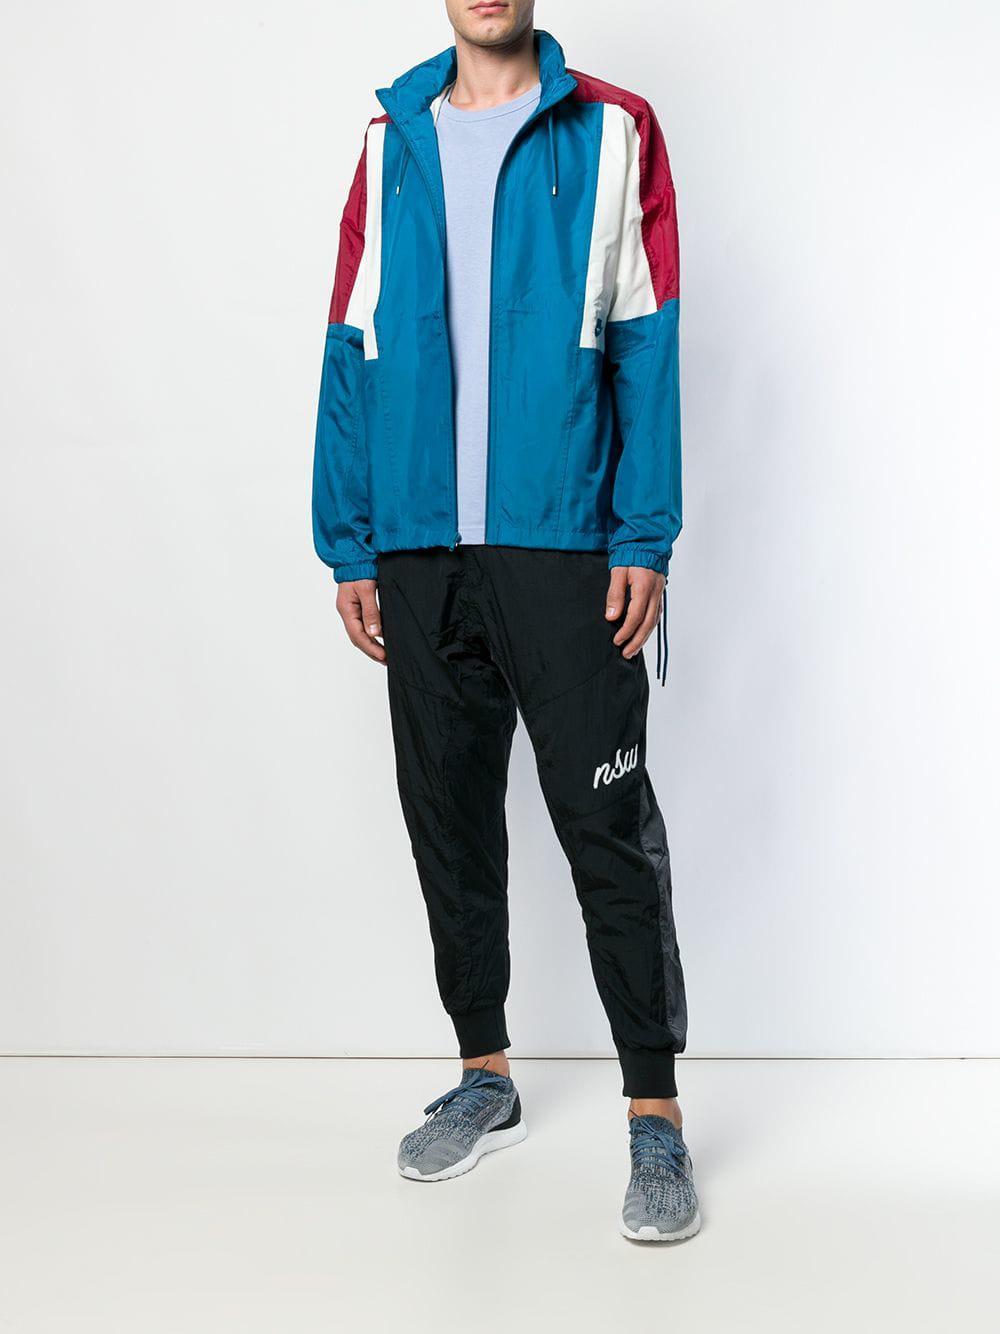 Nike - Green Sportswear Woven Jacket for Men - Lyst. View fullscreen 9627cc5fb67d